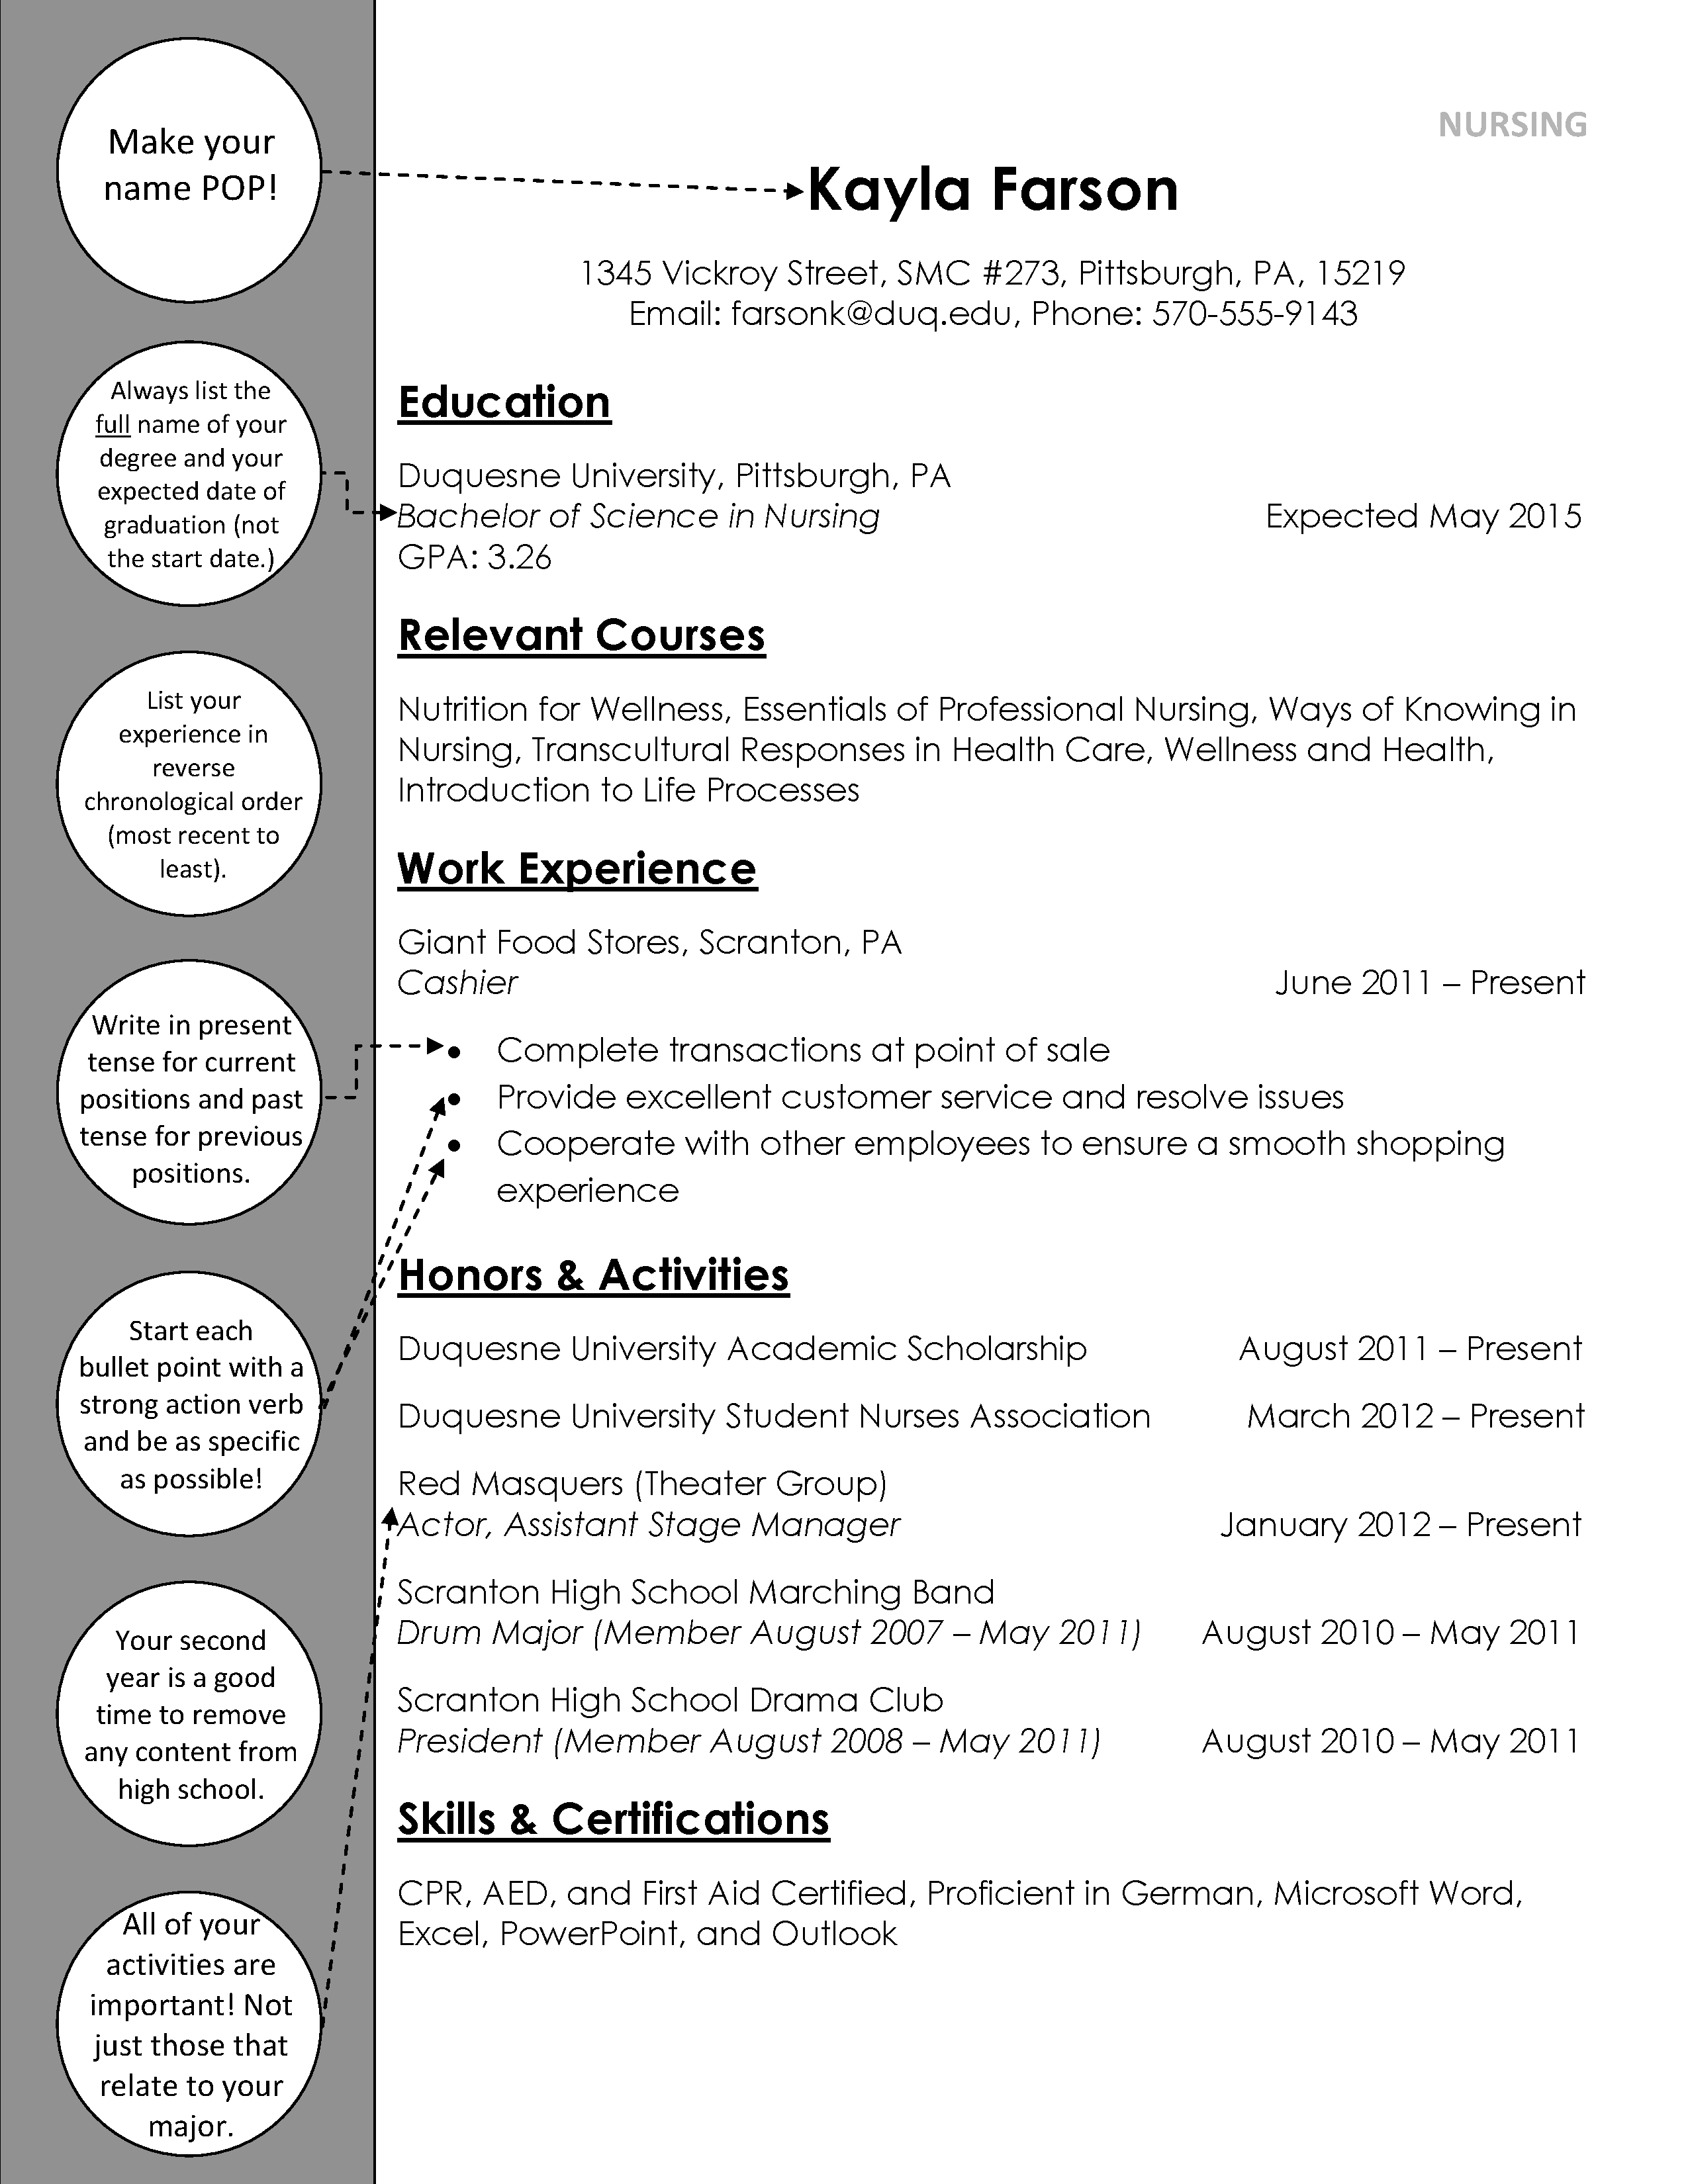 Nursing Underclass Resume Duquesne Resume & Cover Letter